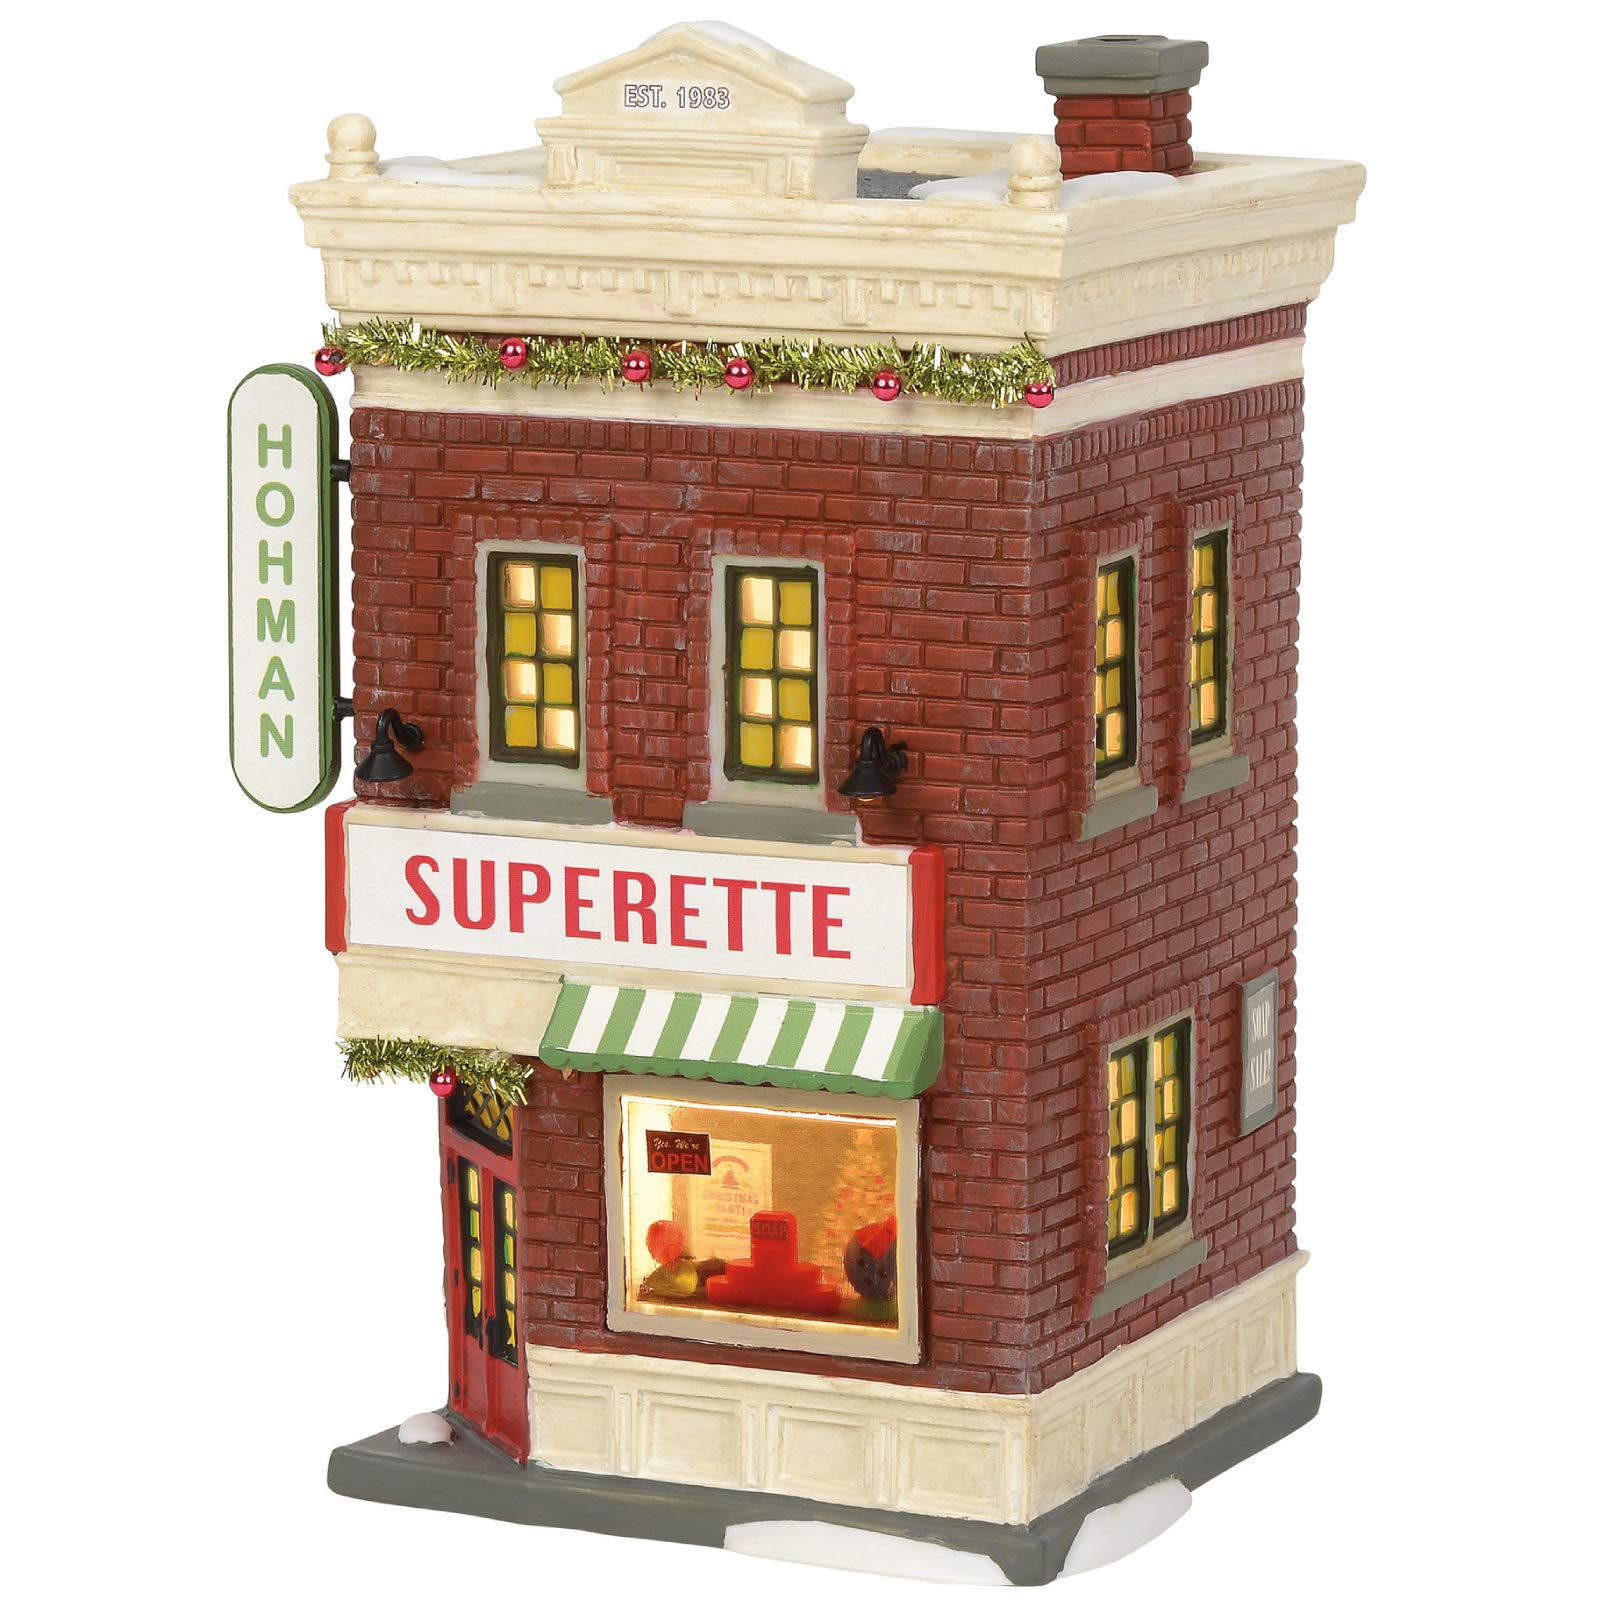 Department 56 A Christmas Story Village Hohman Superette Lit Building, 7.83 Inch, Multicolor by Department 56